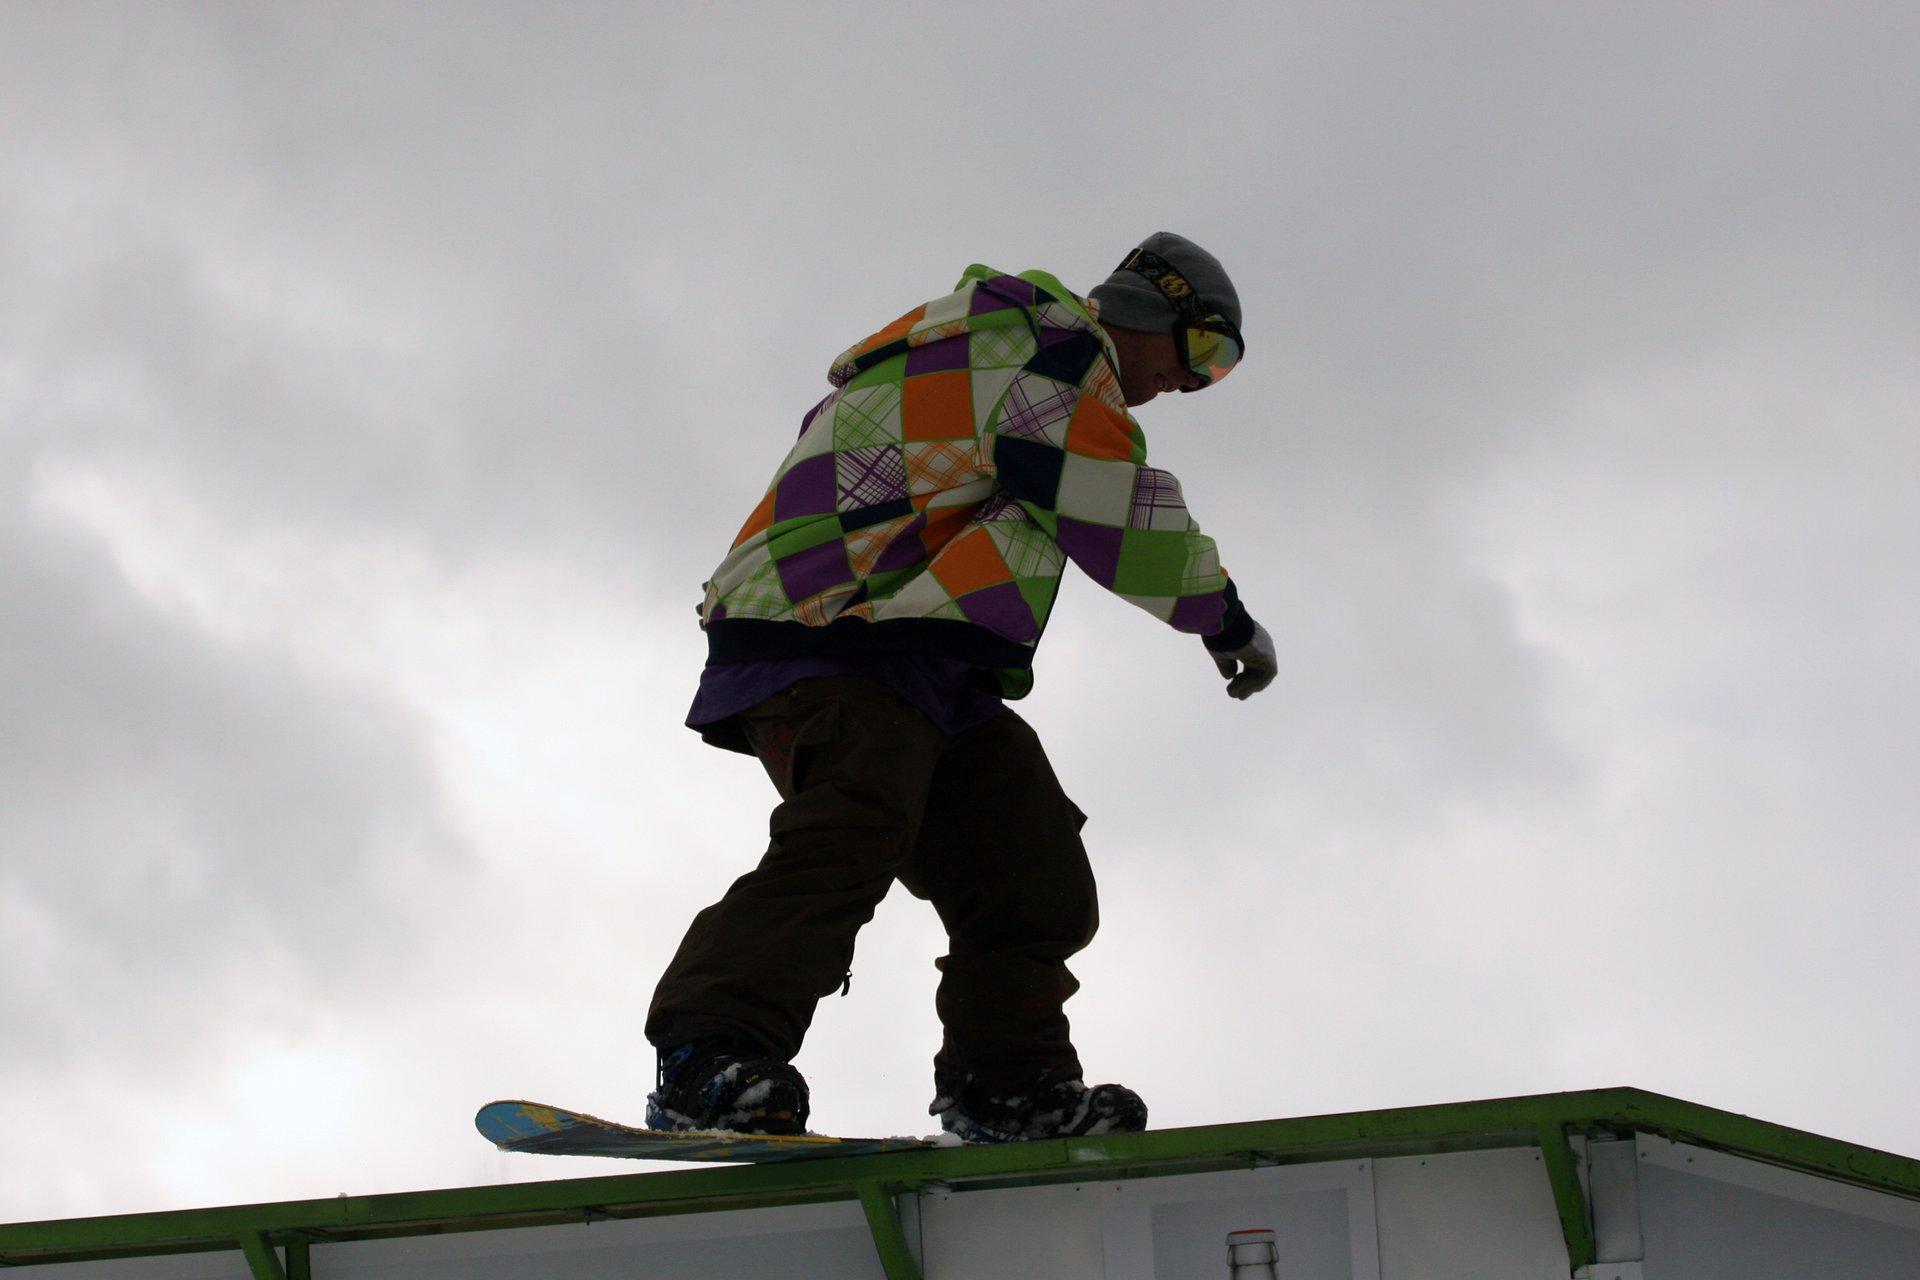 Snowboard bs kink #1